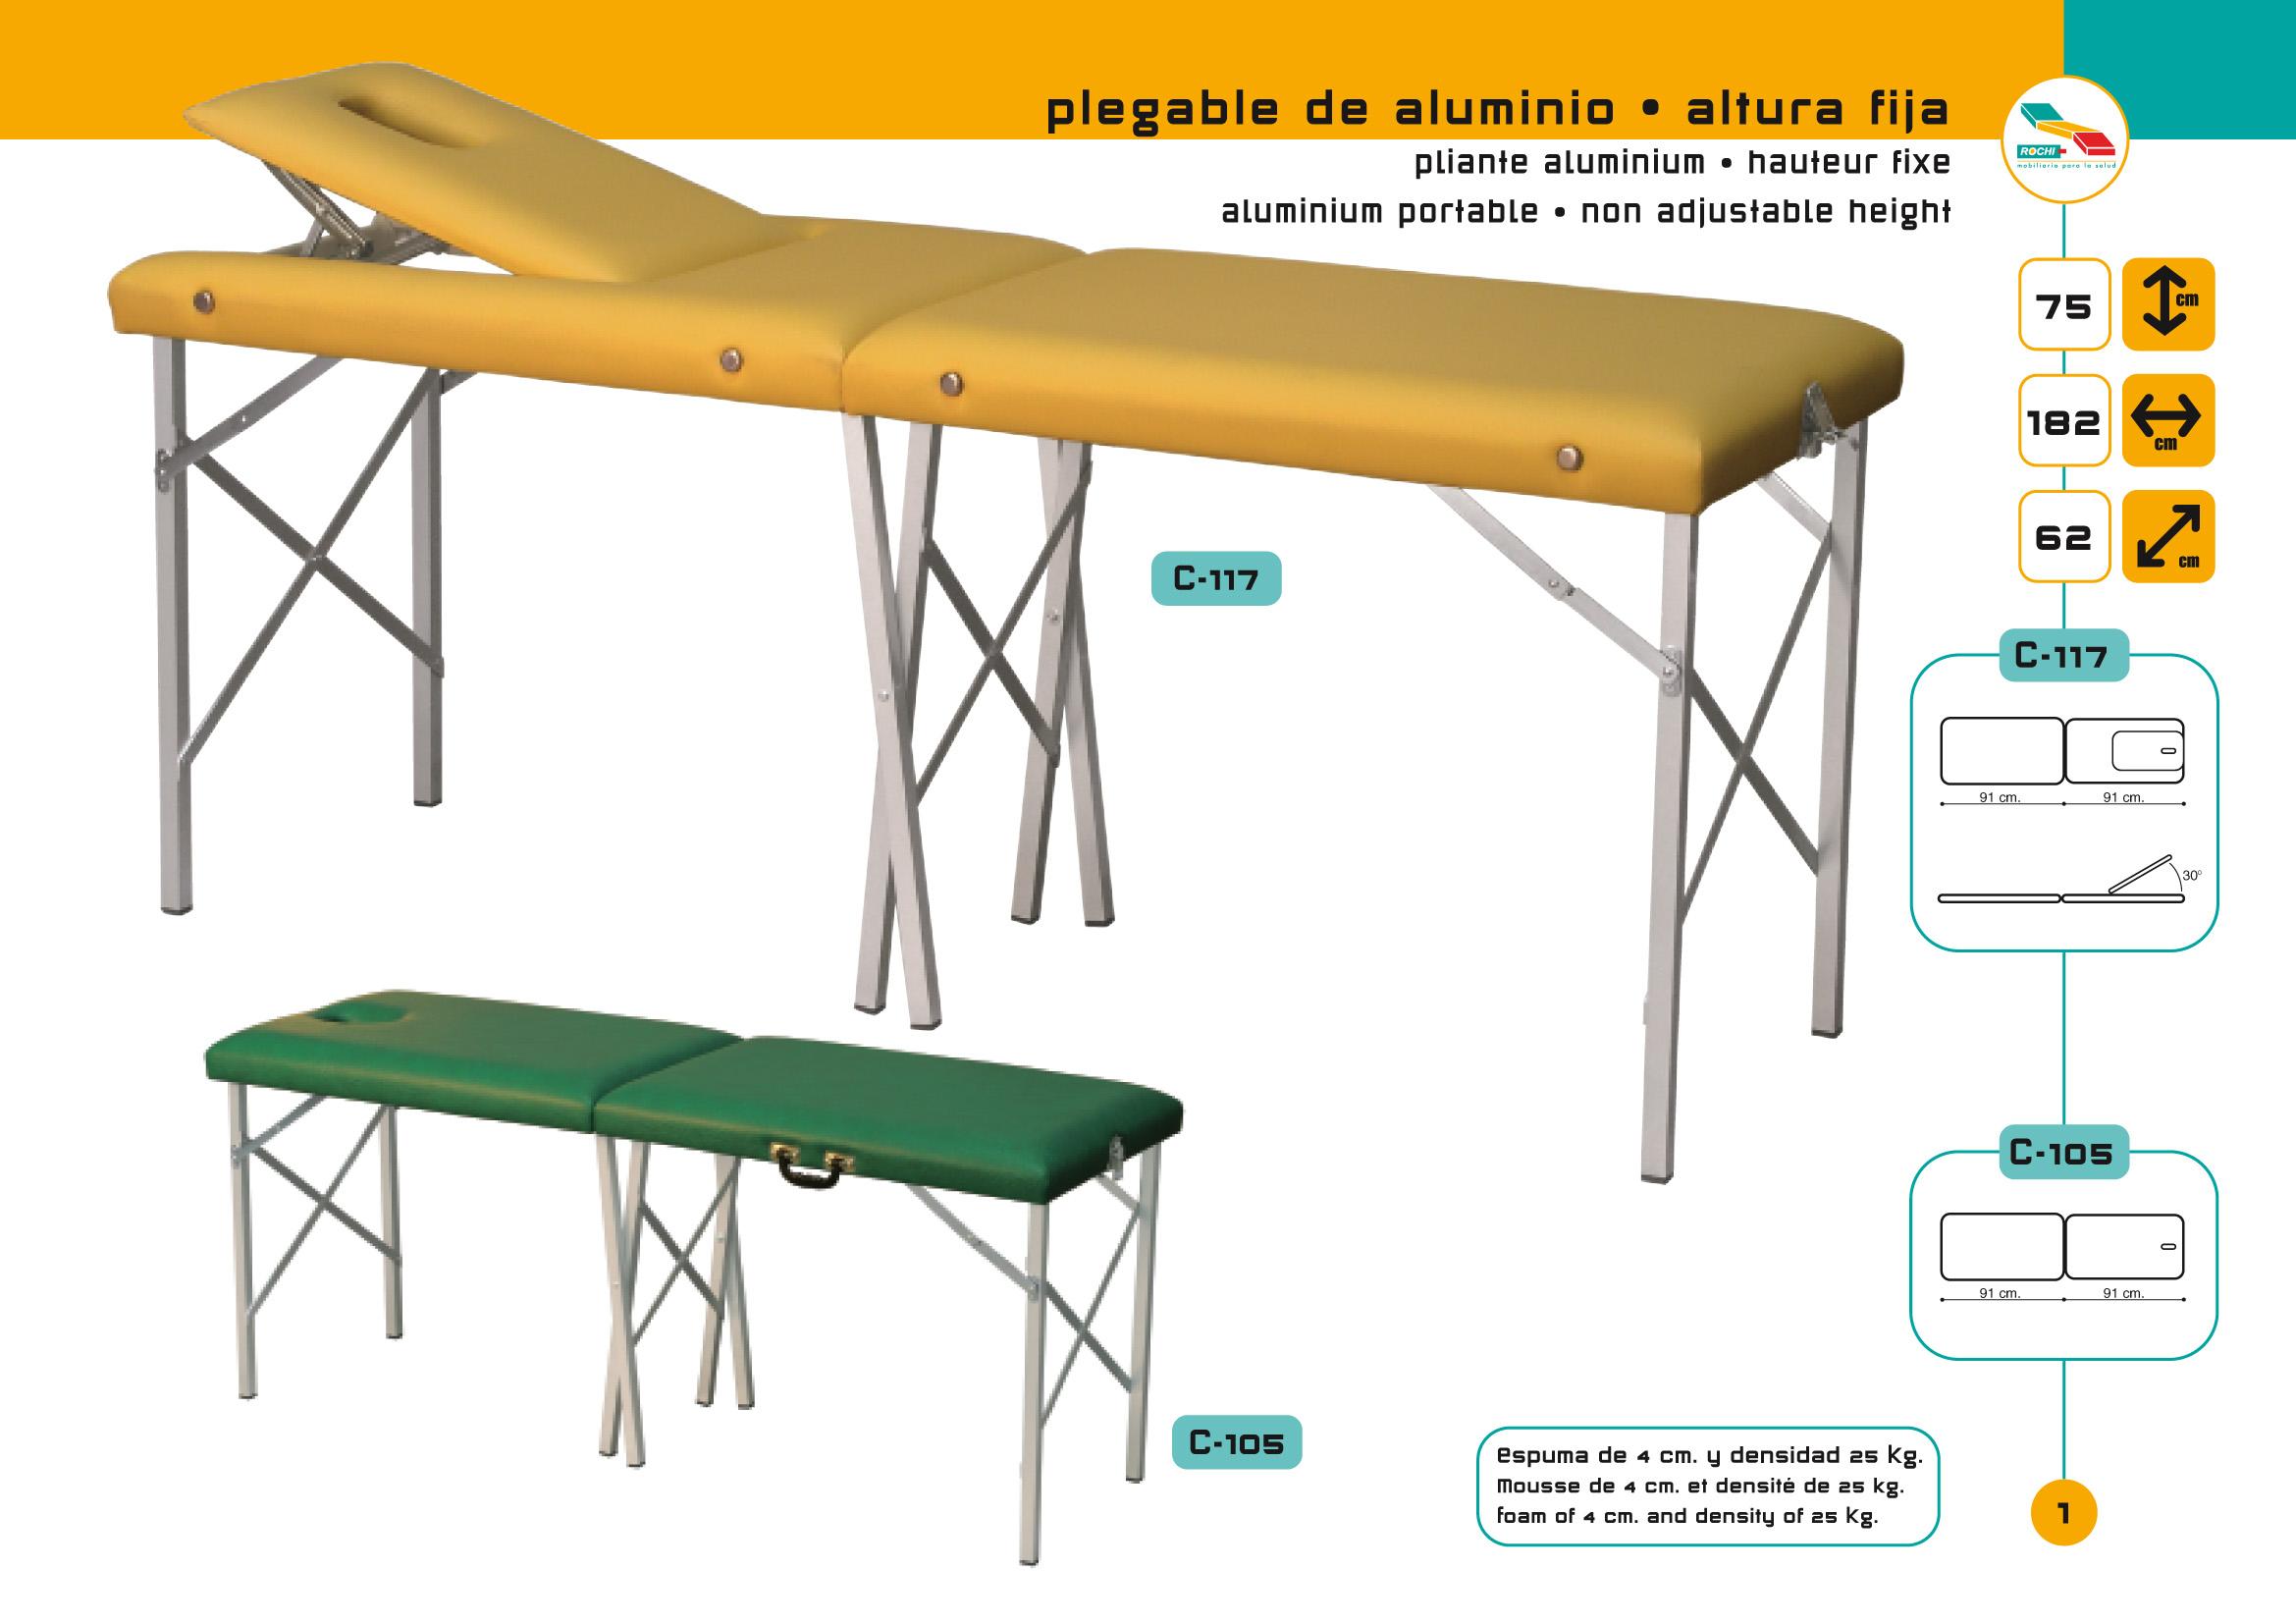 Table de massage pliante c 117 - Table de massage pliante alu ...